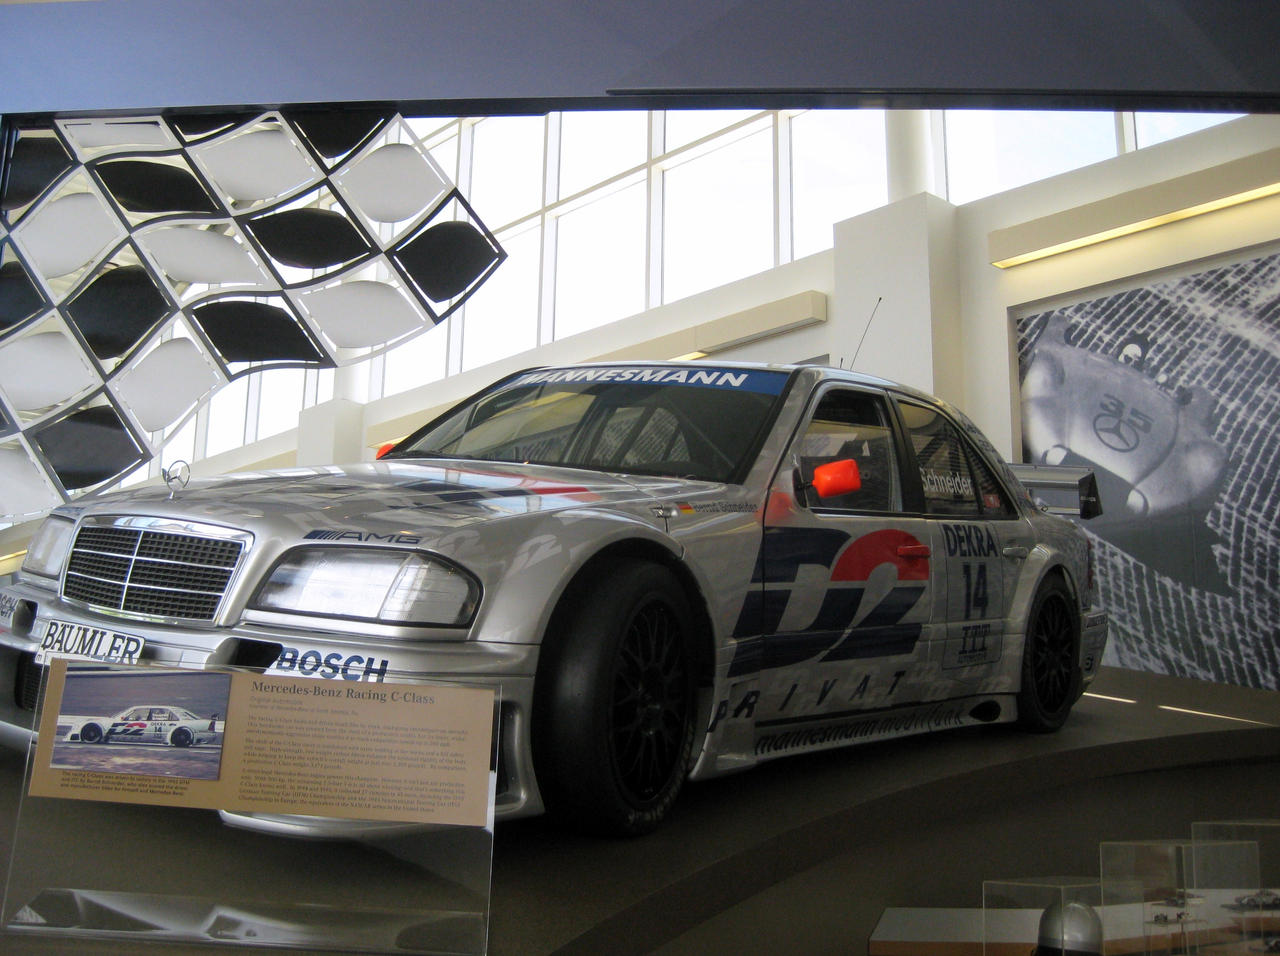 500 hp v6 mercedes benz racer by cyrus1977 on deviantart for 500 hp mercedes benz